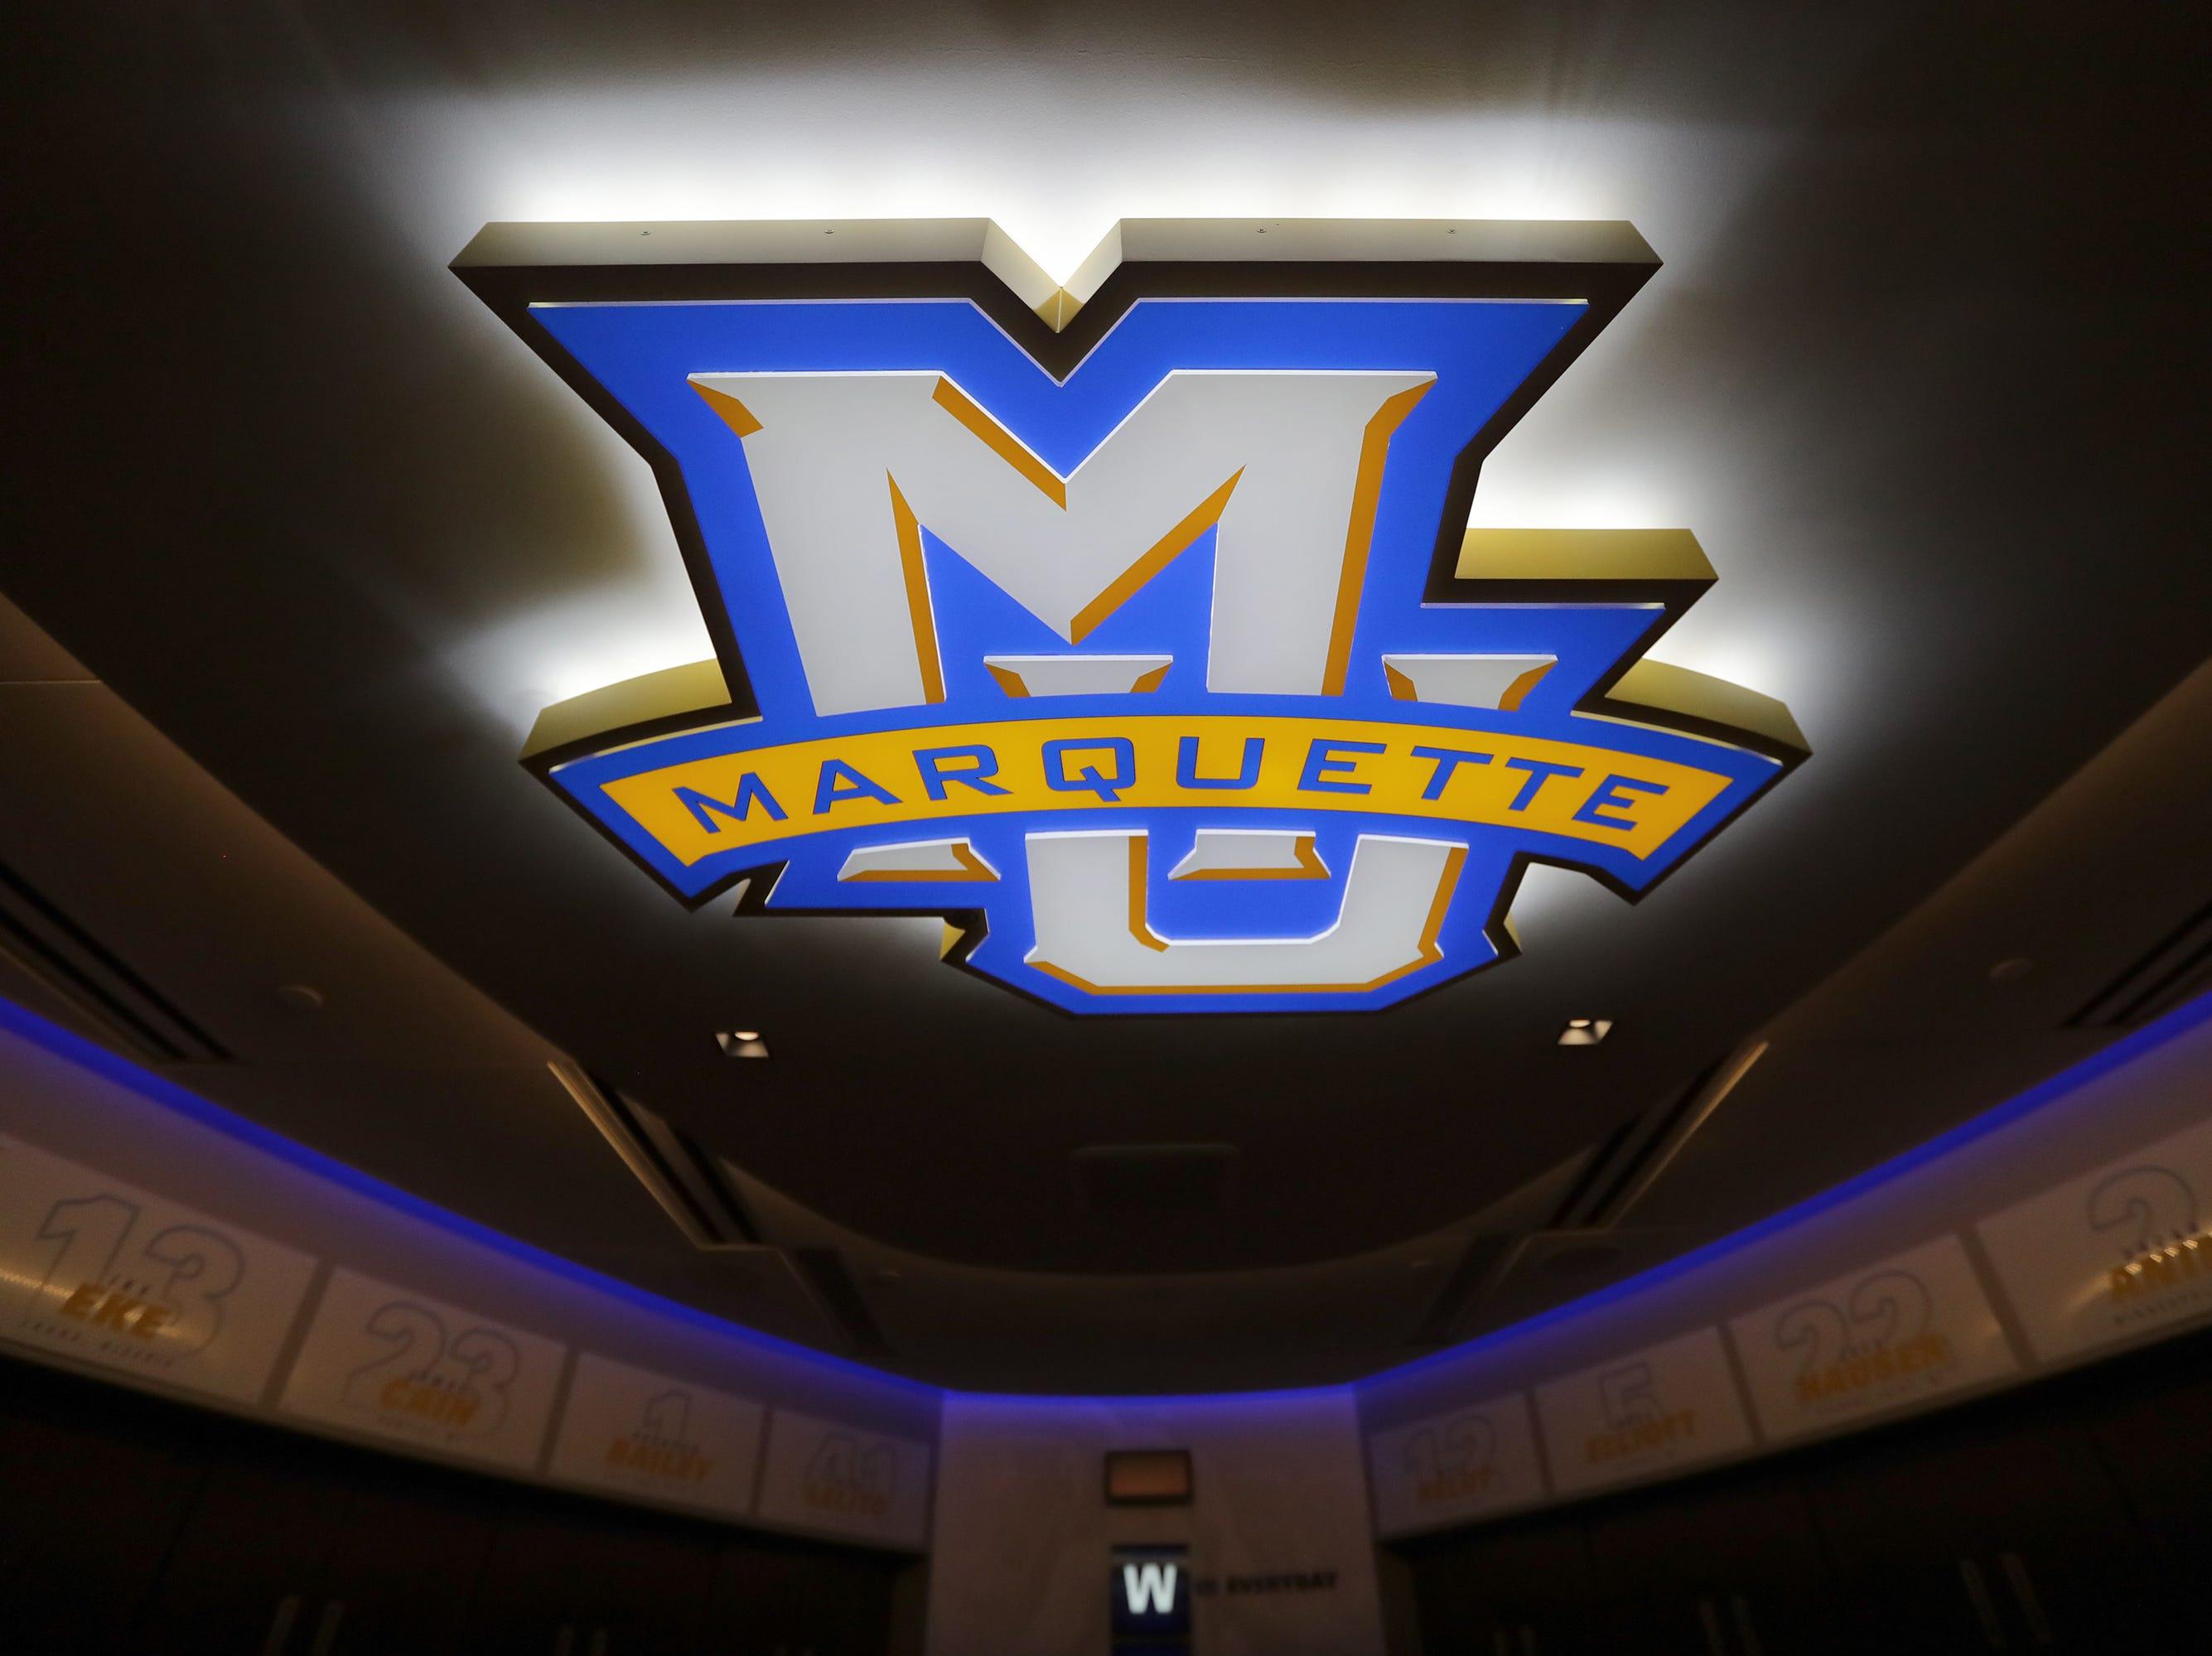 A bright Marquette logo adorns the new Marquette mens' basketball team locker room at the Fiserv Forum.